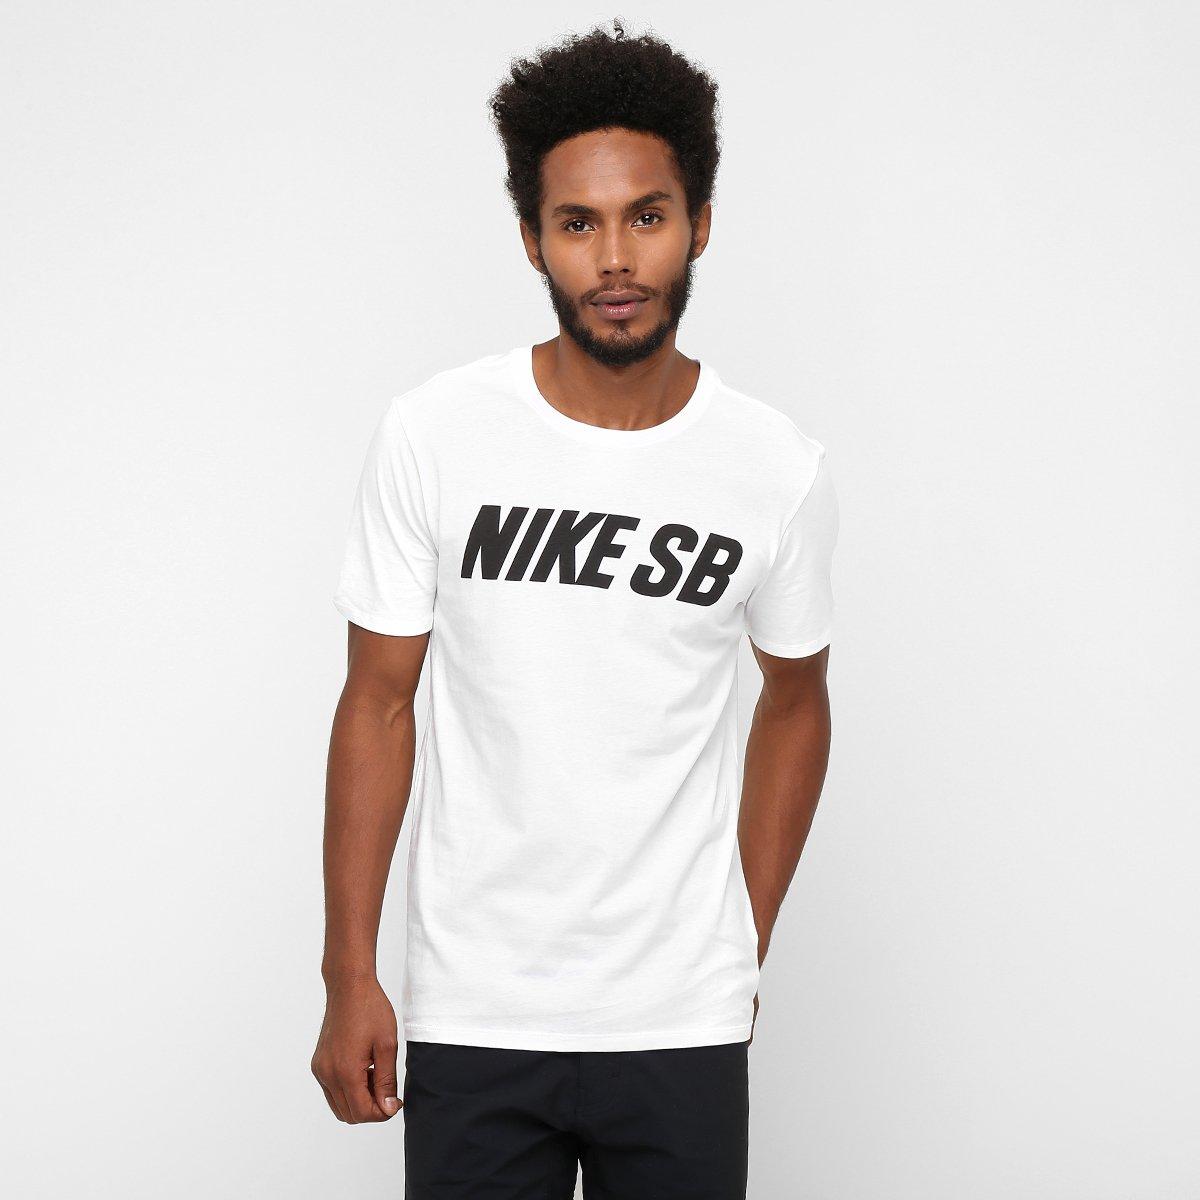 11713fc538064 Camiseta Nike Sb Block Tee - Compre Agora